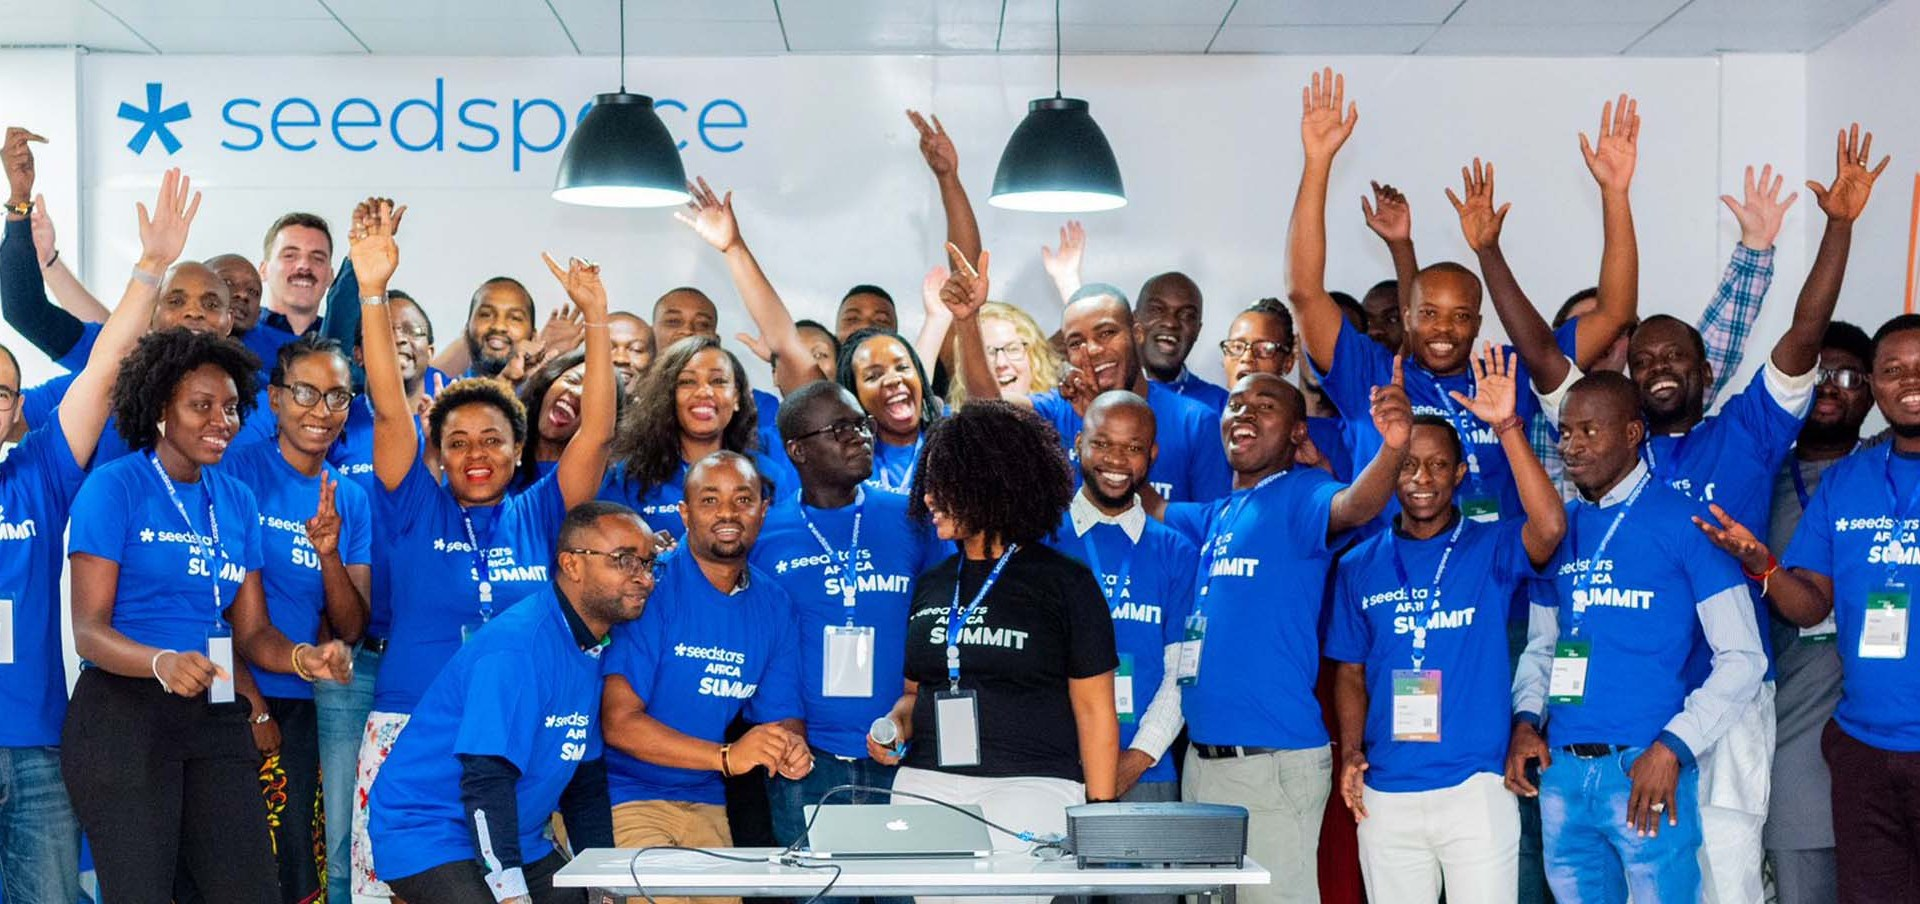 Seedstars to Invest $100 Million Fund in African Tech Startups